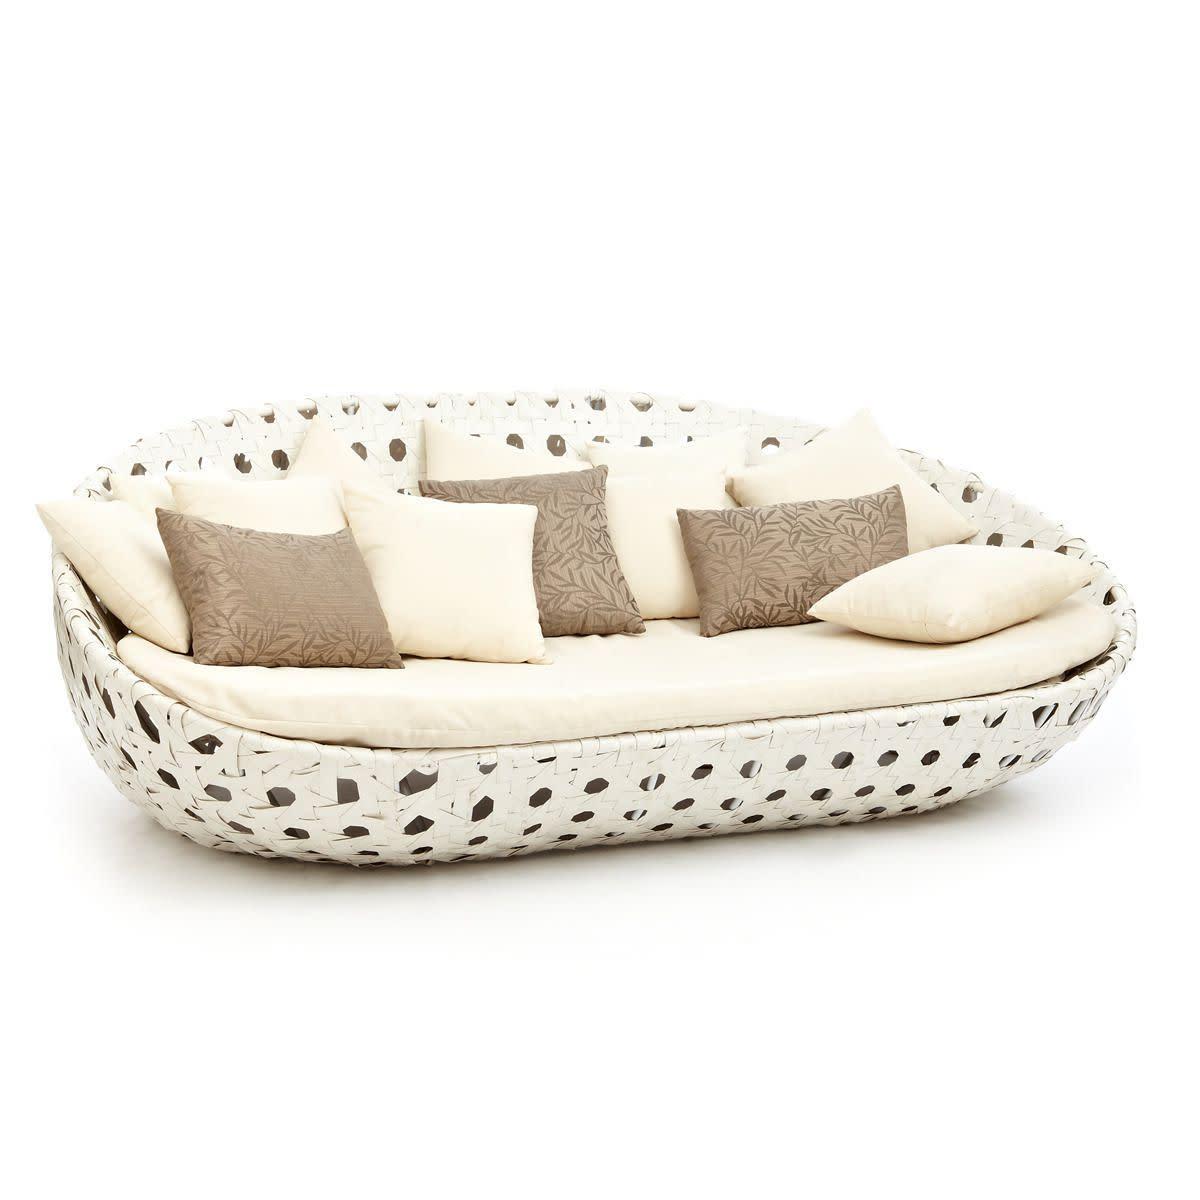 Outdoor-Sofa, inkl.Kissen, Aluminiumgestell, Kunststoffgeflecht, Polyester (Impressionen)